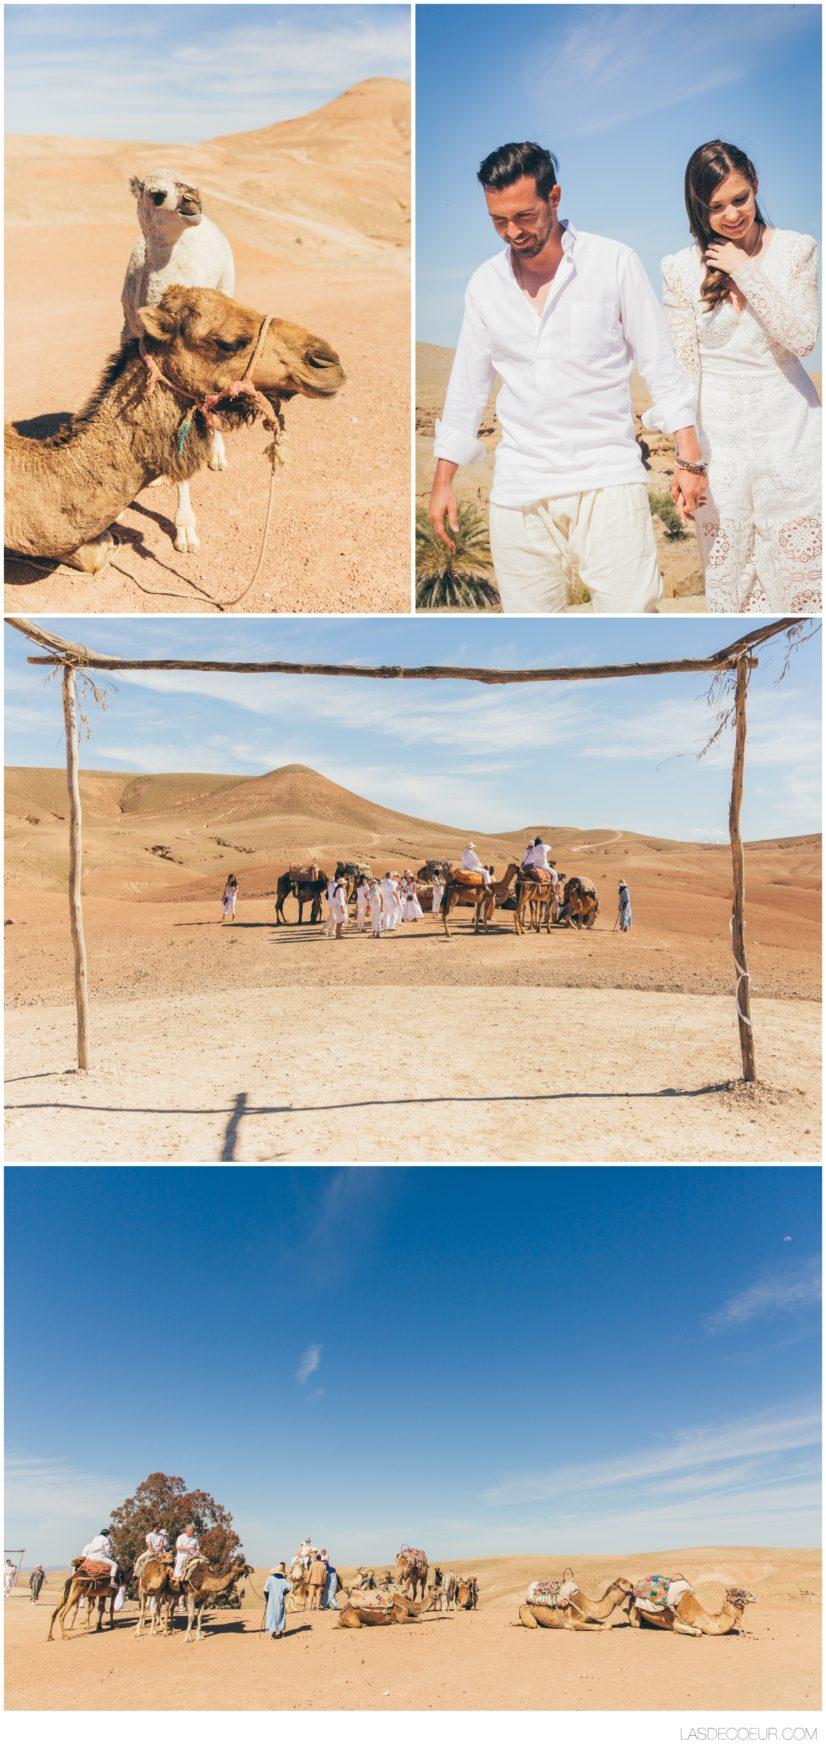 Photo mariage Marrakech désert Agafay